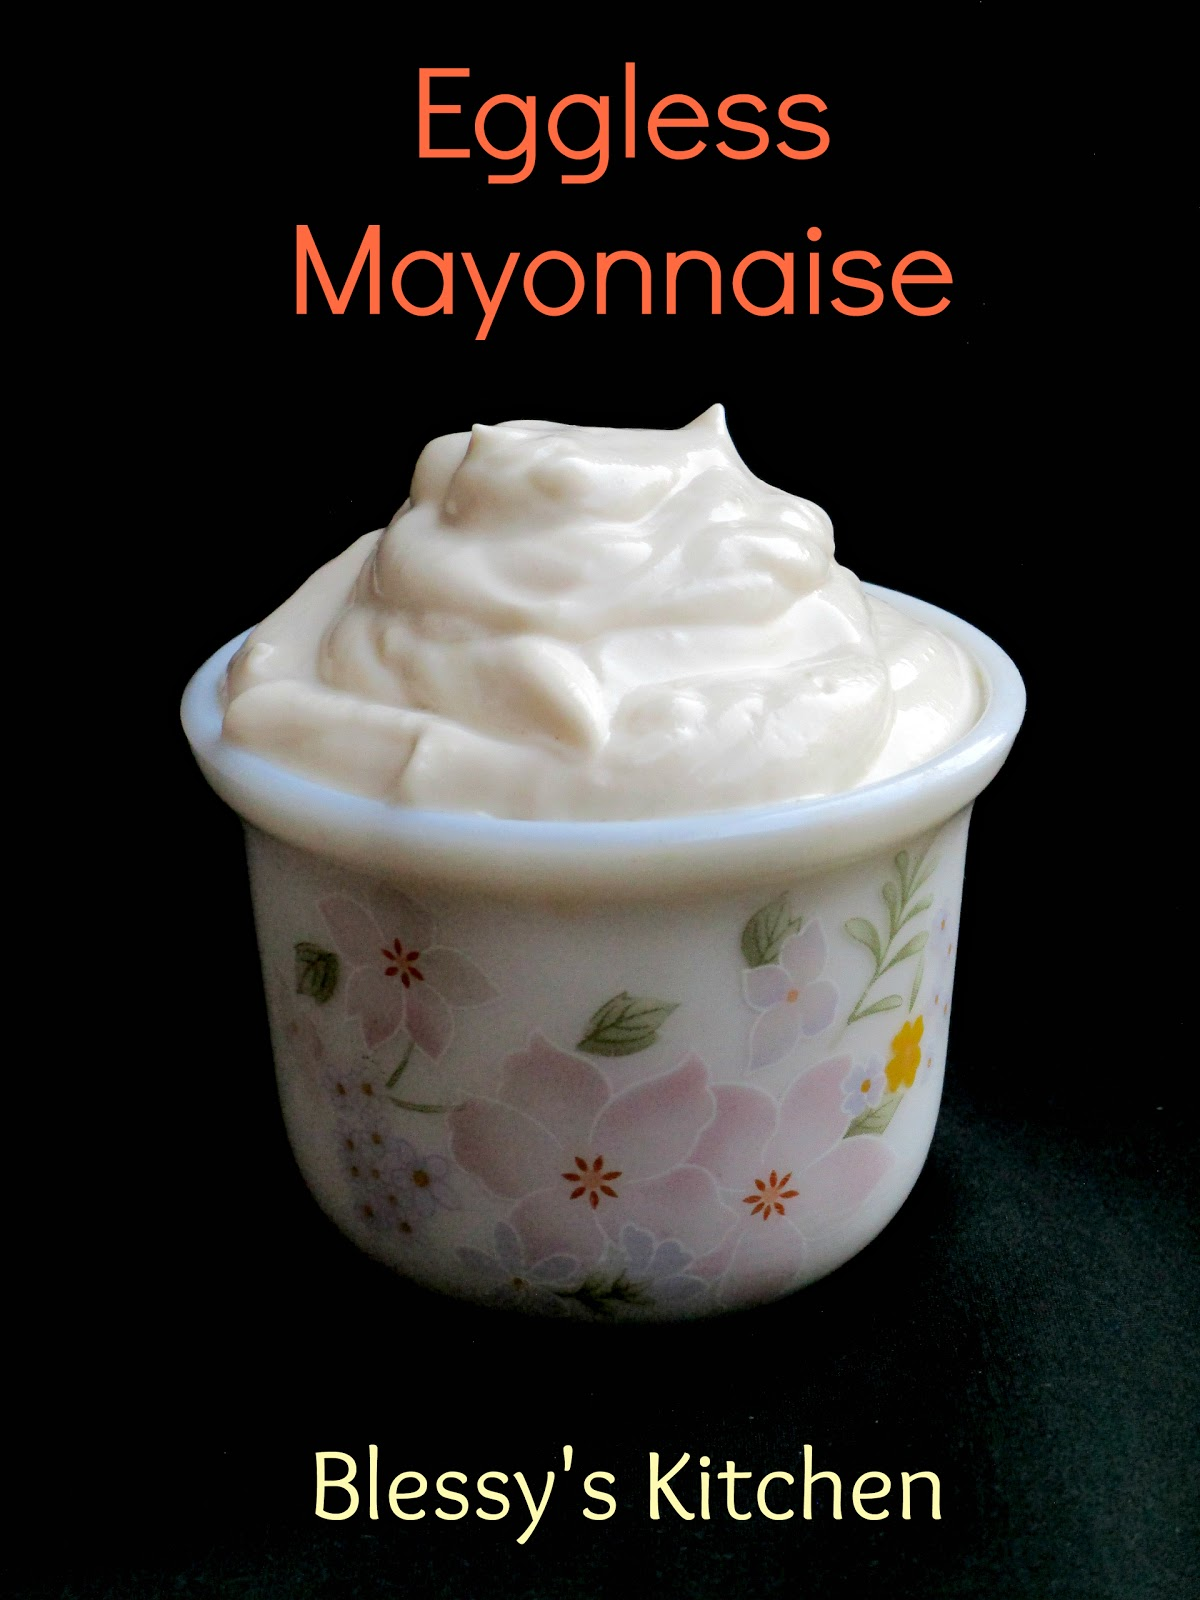 Eggless Mayonnaise/ Homemade Eggless Mayo/ Homemade Eggless Mayonnaise